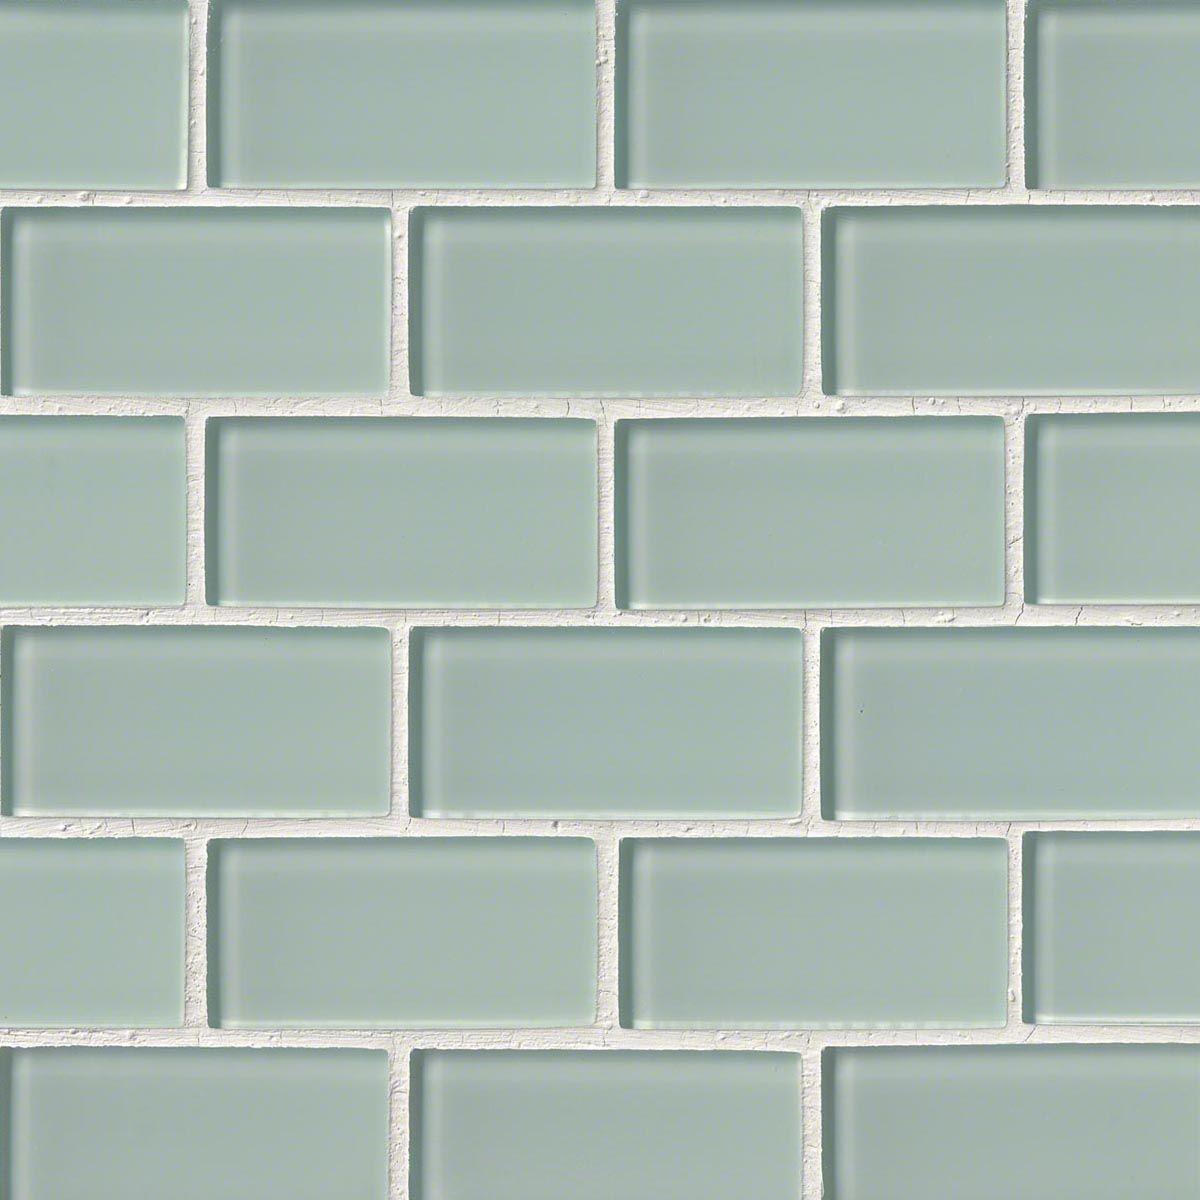 Pretty 1 Ceramic Tiles Tall 12X24 Ceiling Tile Rectangular 12X24 Floor Tile Patterns 24 X 48 Ceiling Tiles Drop Ceiling Old 2X4 Ceiling Tiles Home Depot Dark3X6 Ceramic Subway Tile Alya Tile Arctic Ice 2x4 Brick Glass Mosaic Tile   Alya Tile ..